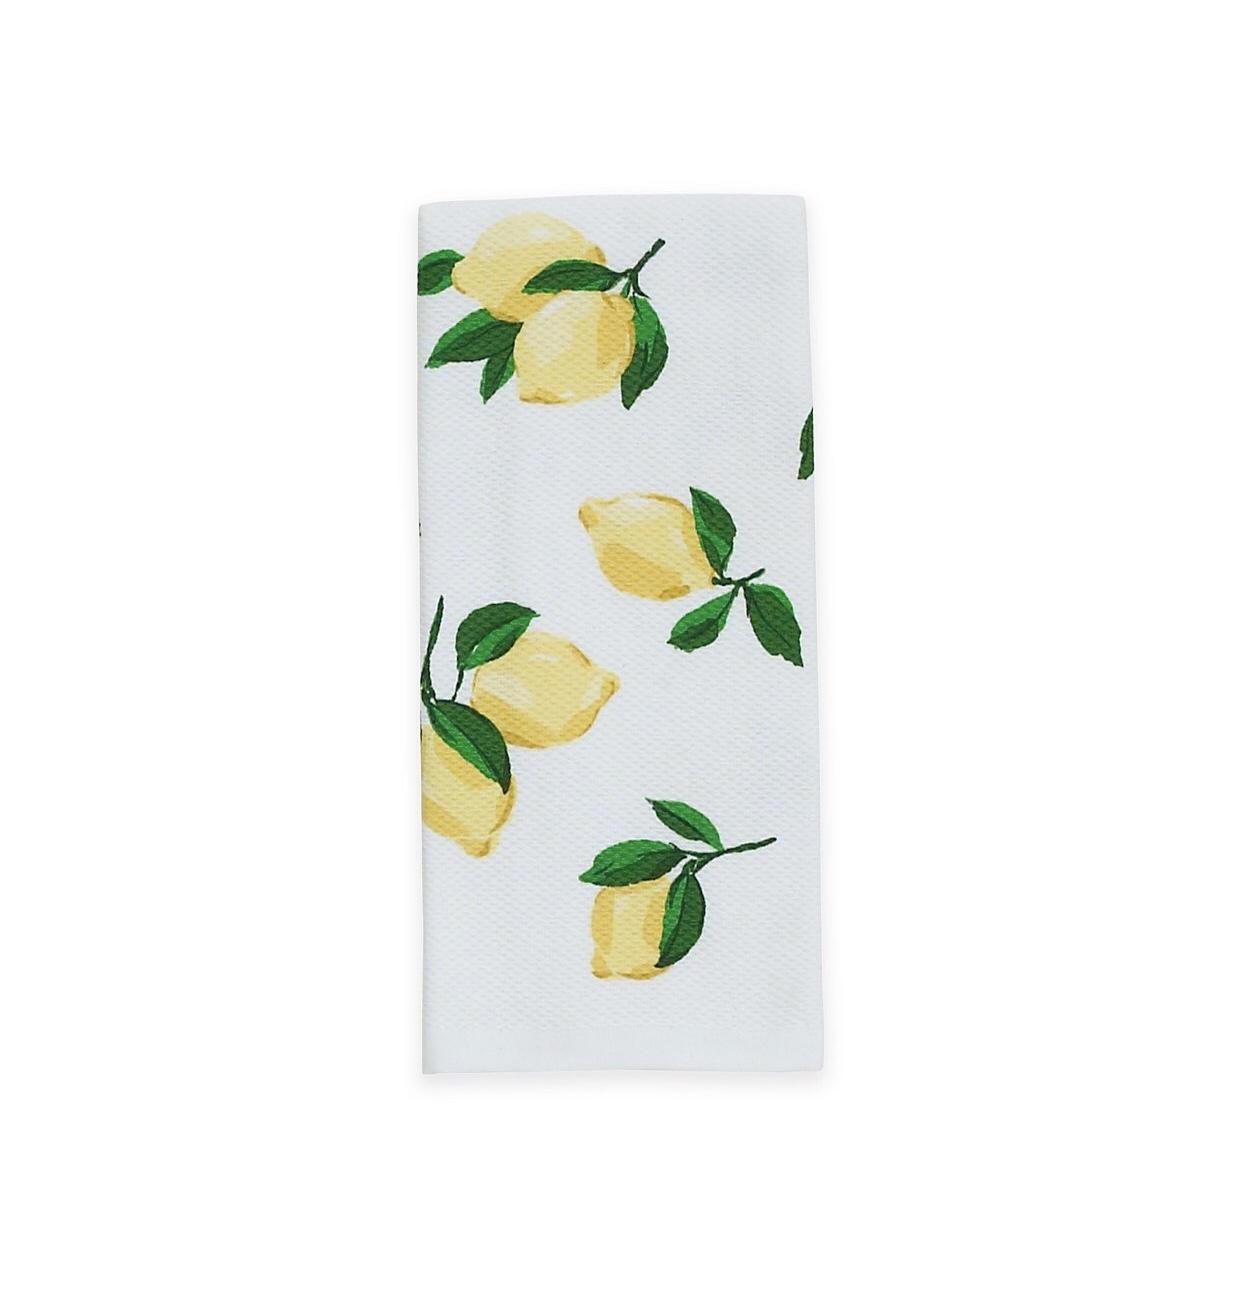 https://www.katespade.com/products/make-lemonade-kitchen-towel/157907WKT.html